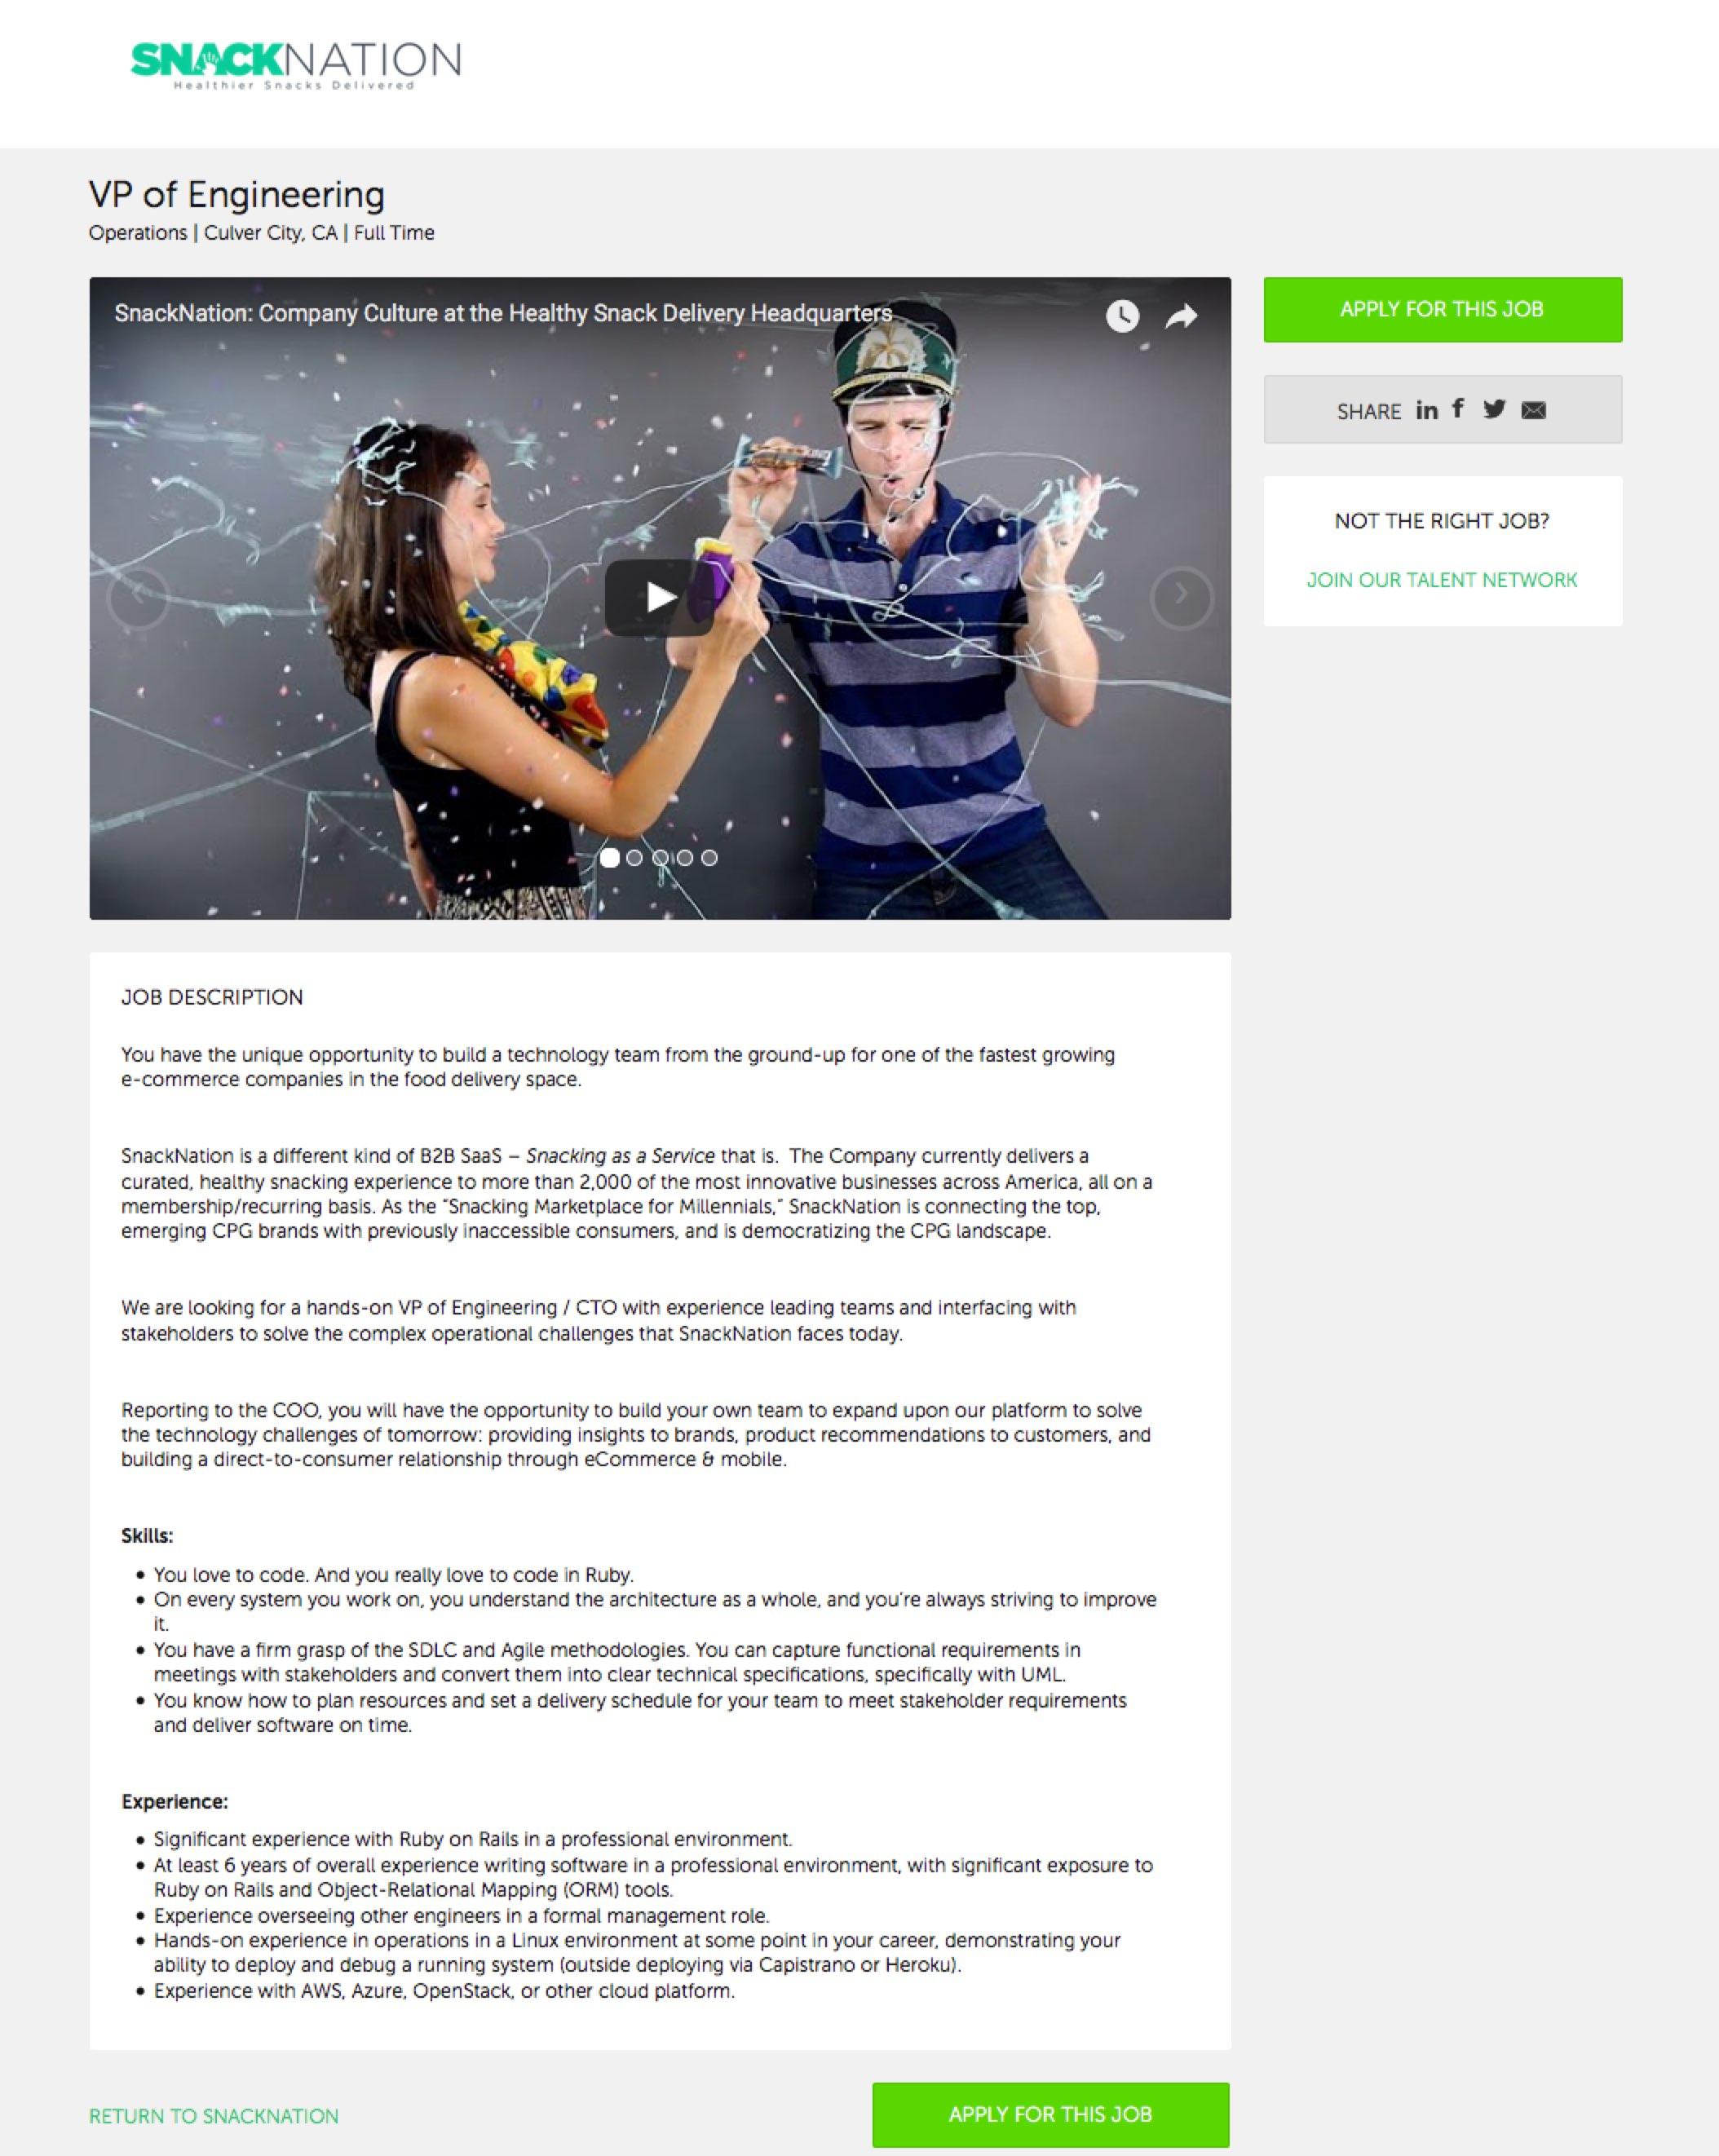 Best Job Descriptions Sample Snack Nation VP of Engineering Ongig Blog